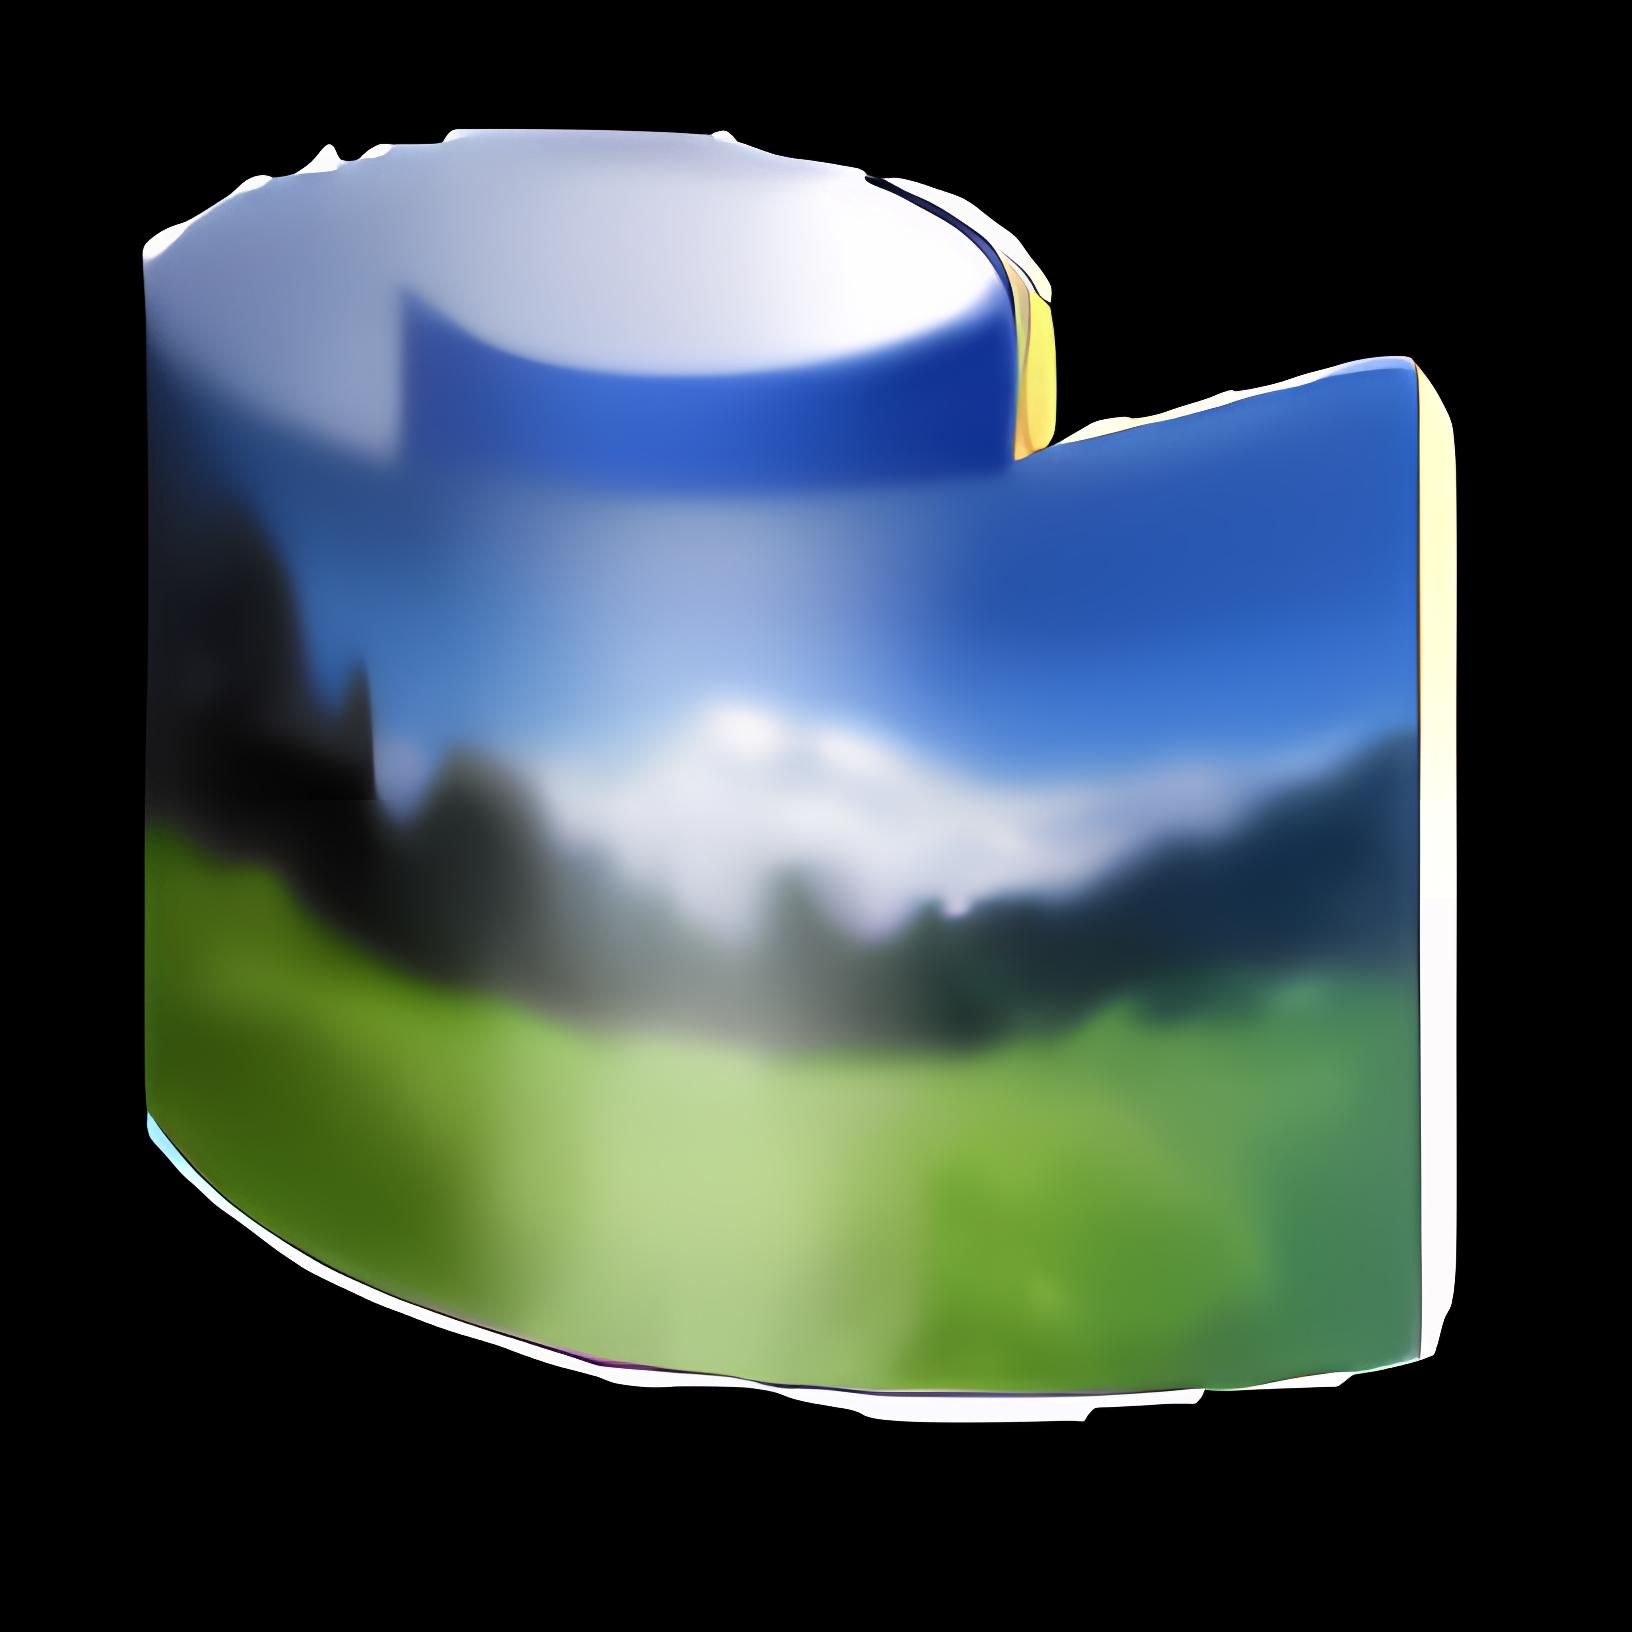 ArcSoft Panorama Maker 7 für Mac